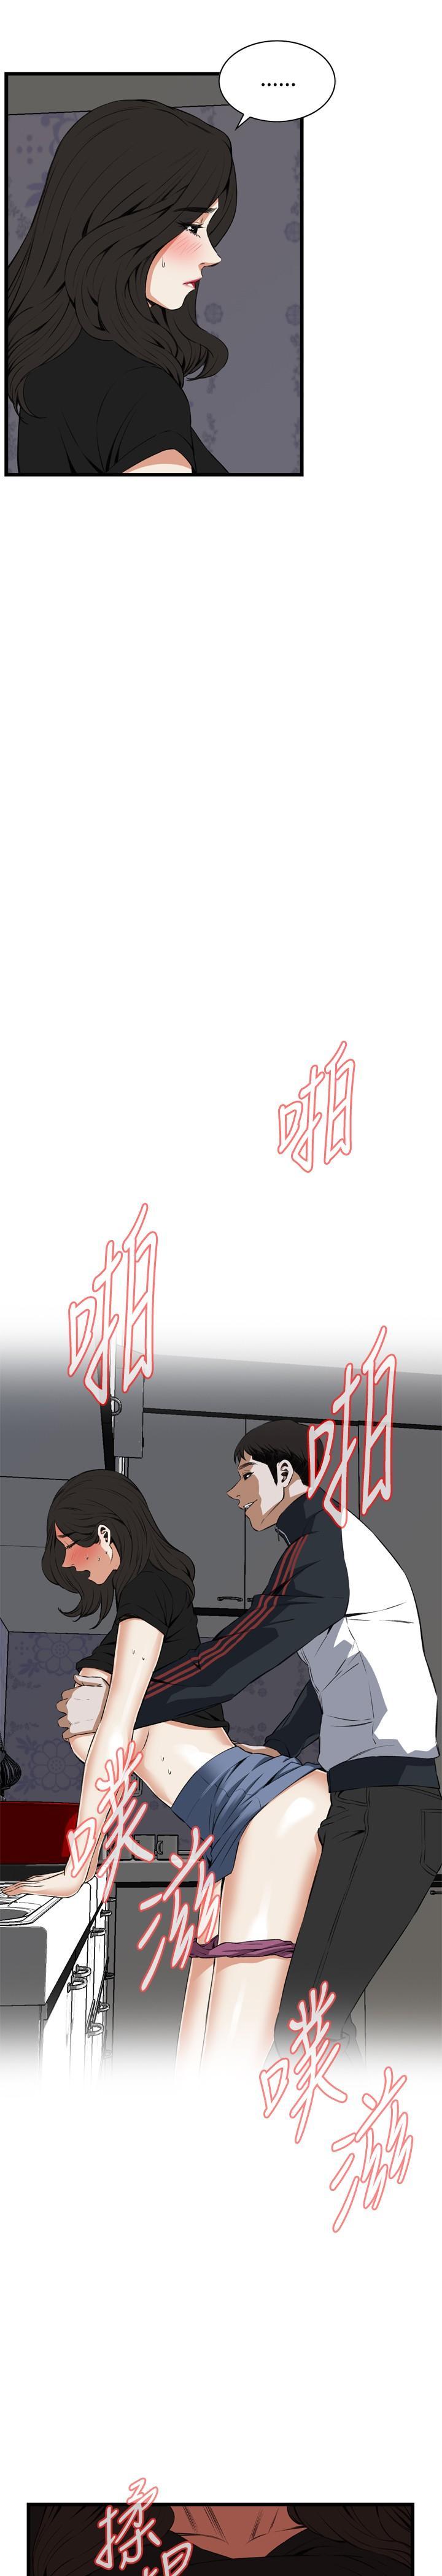 Take a Peek 偷窥 Ch.39~60 [Chinese]中文 599